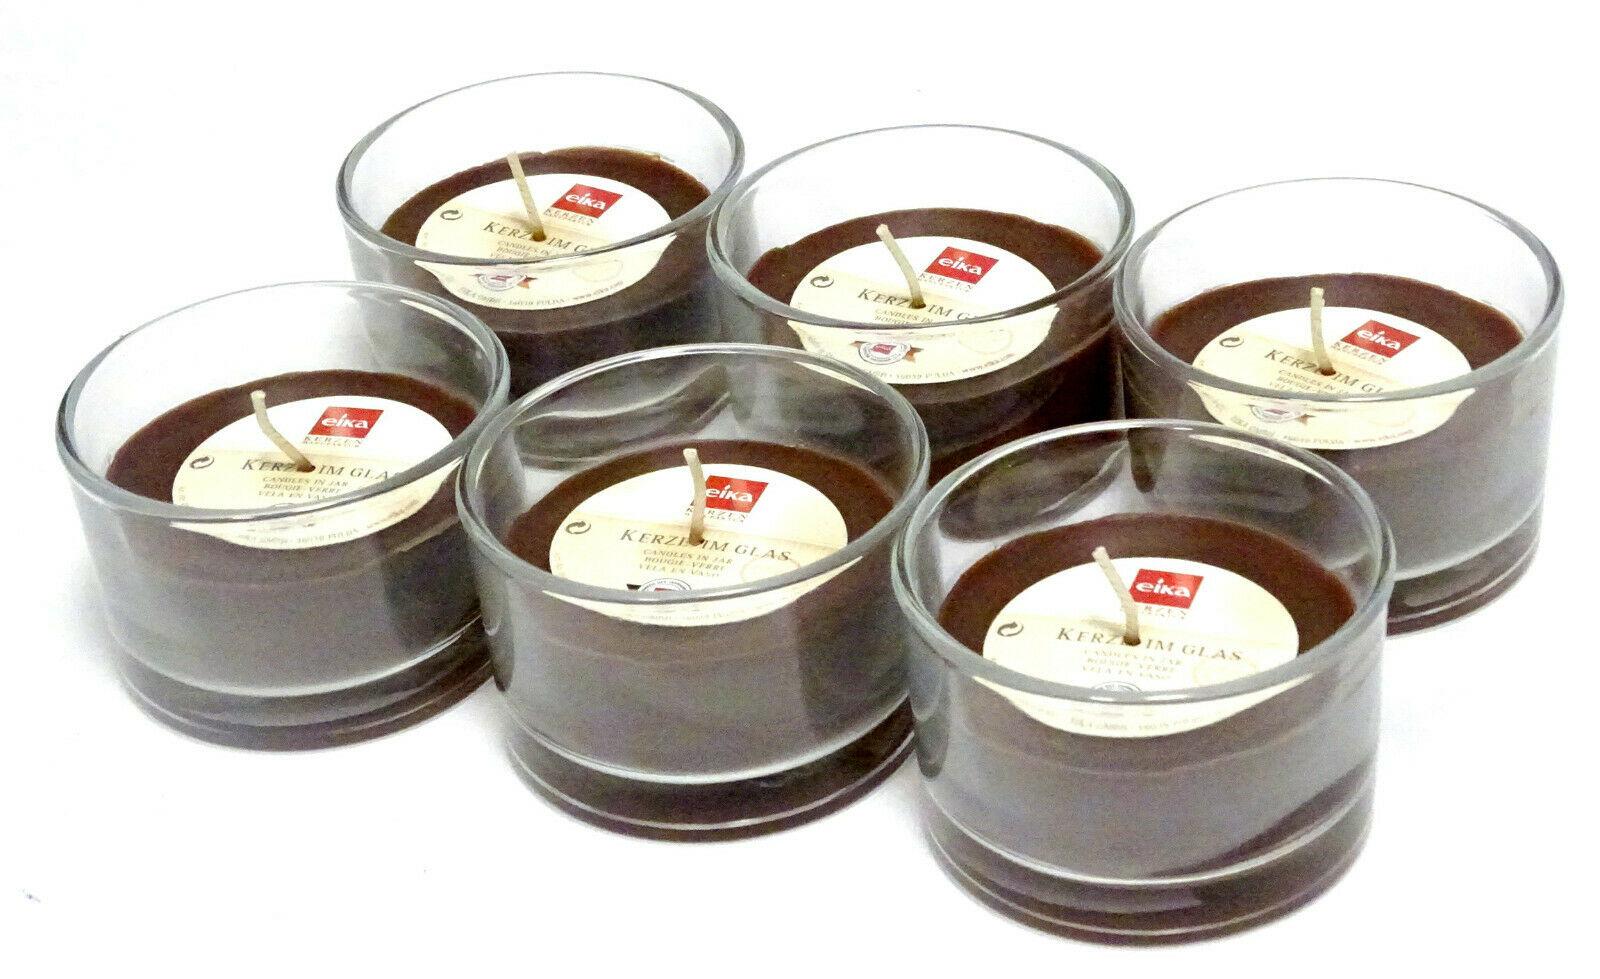 6 Stück Kerze im Glas durchgefärbte Wachs Ø 87 x 57 mm Kerzenglas Windlichtkerze - Braun 268